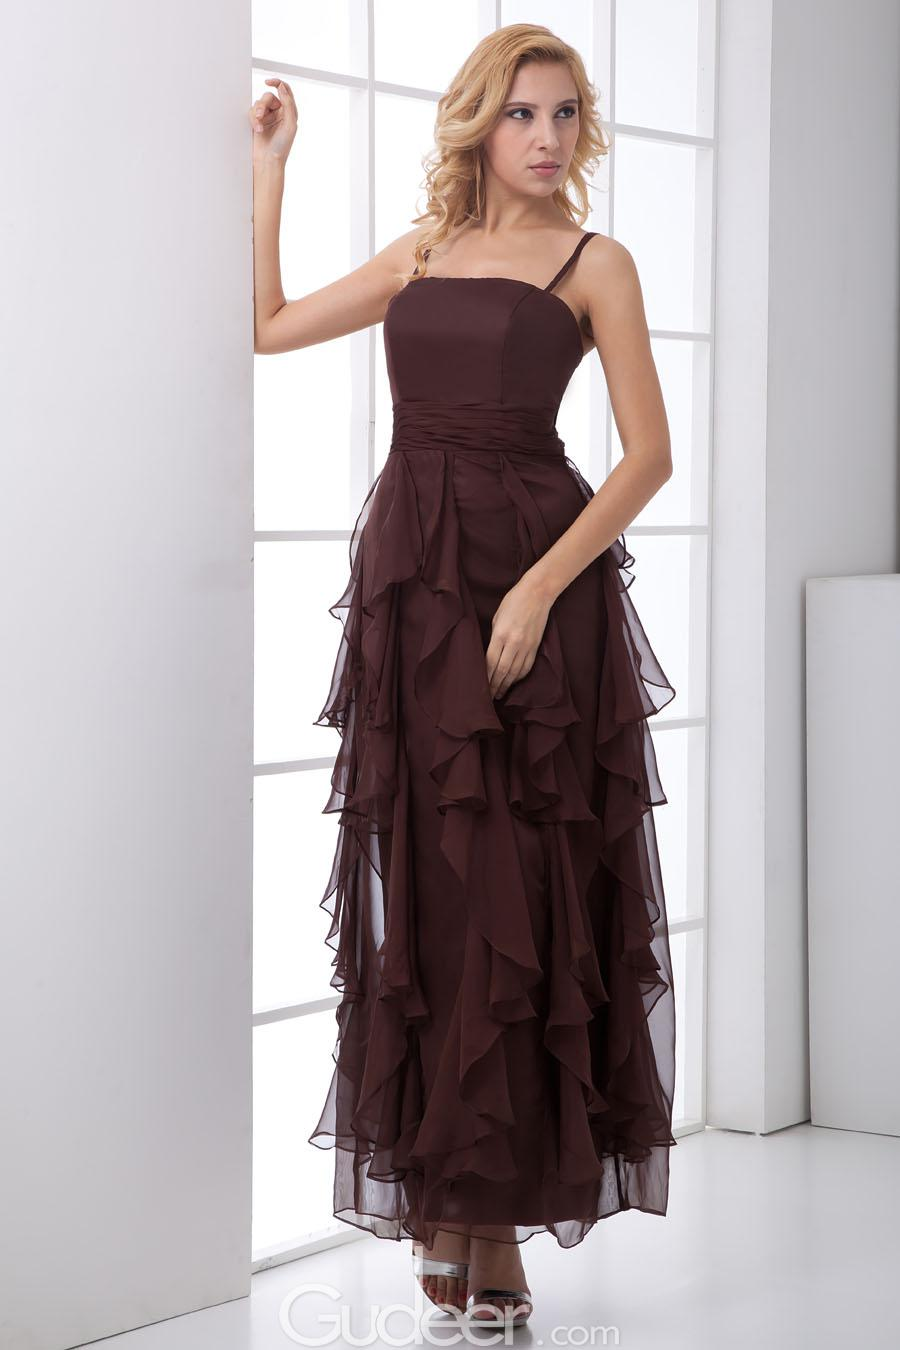 Chocolate brown bridesmaid dress ankle length fashion dresses chocolate brown bridesmaid dress ankle length ombrellifo Choice Image